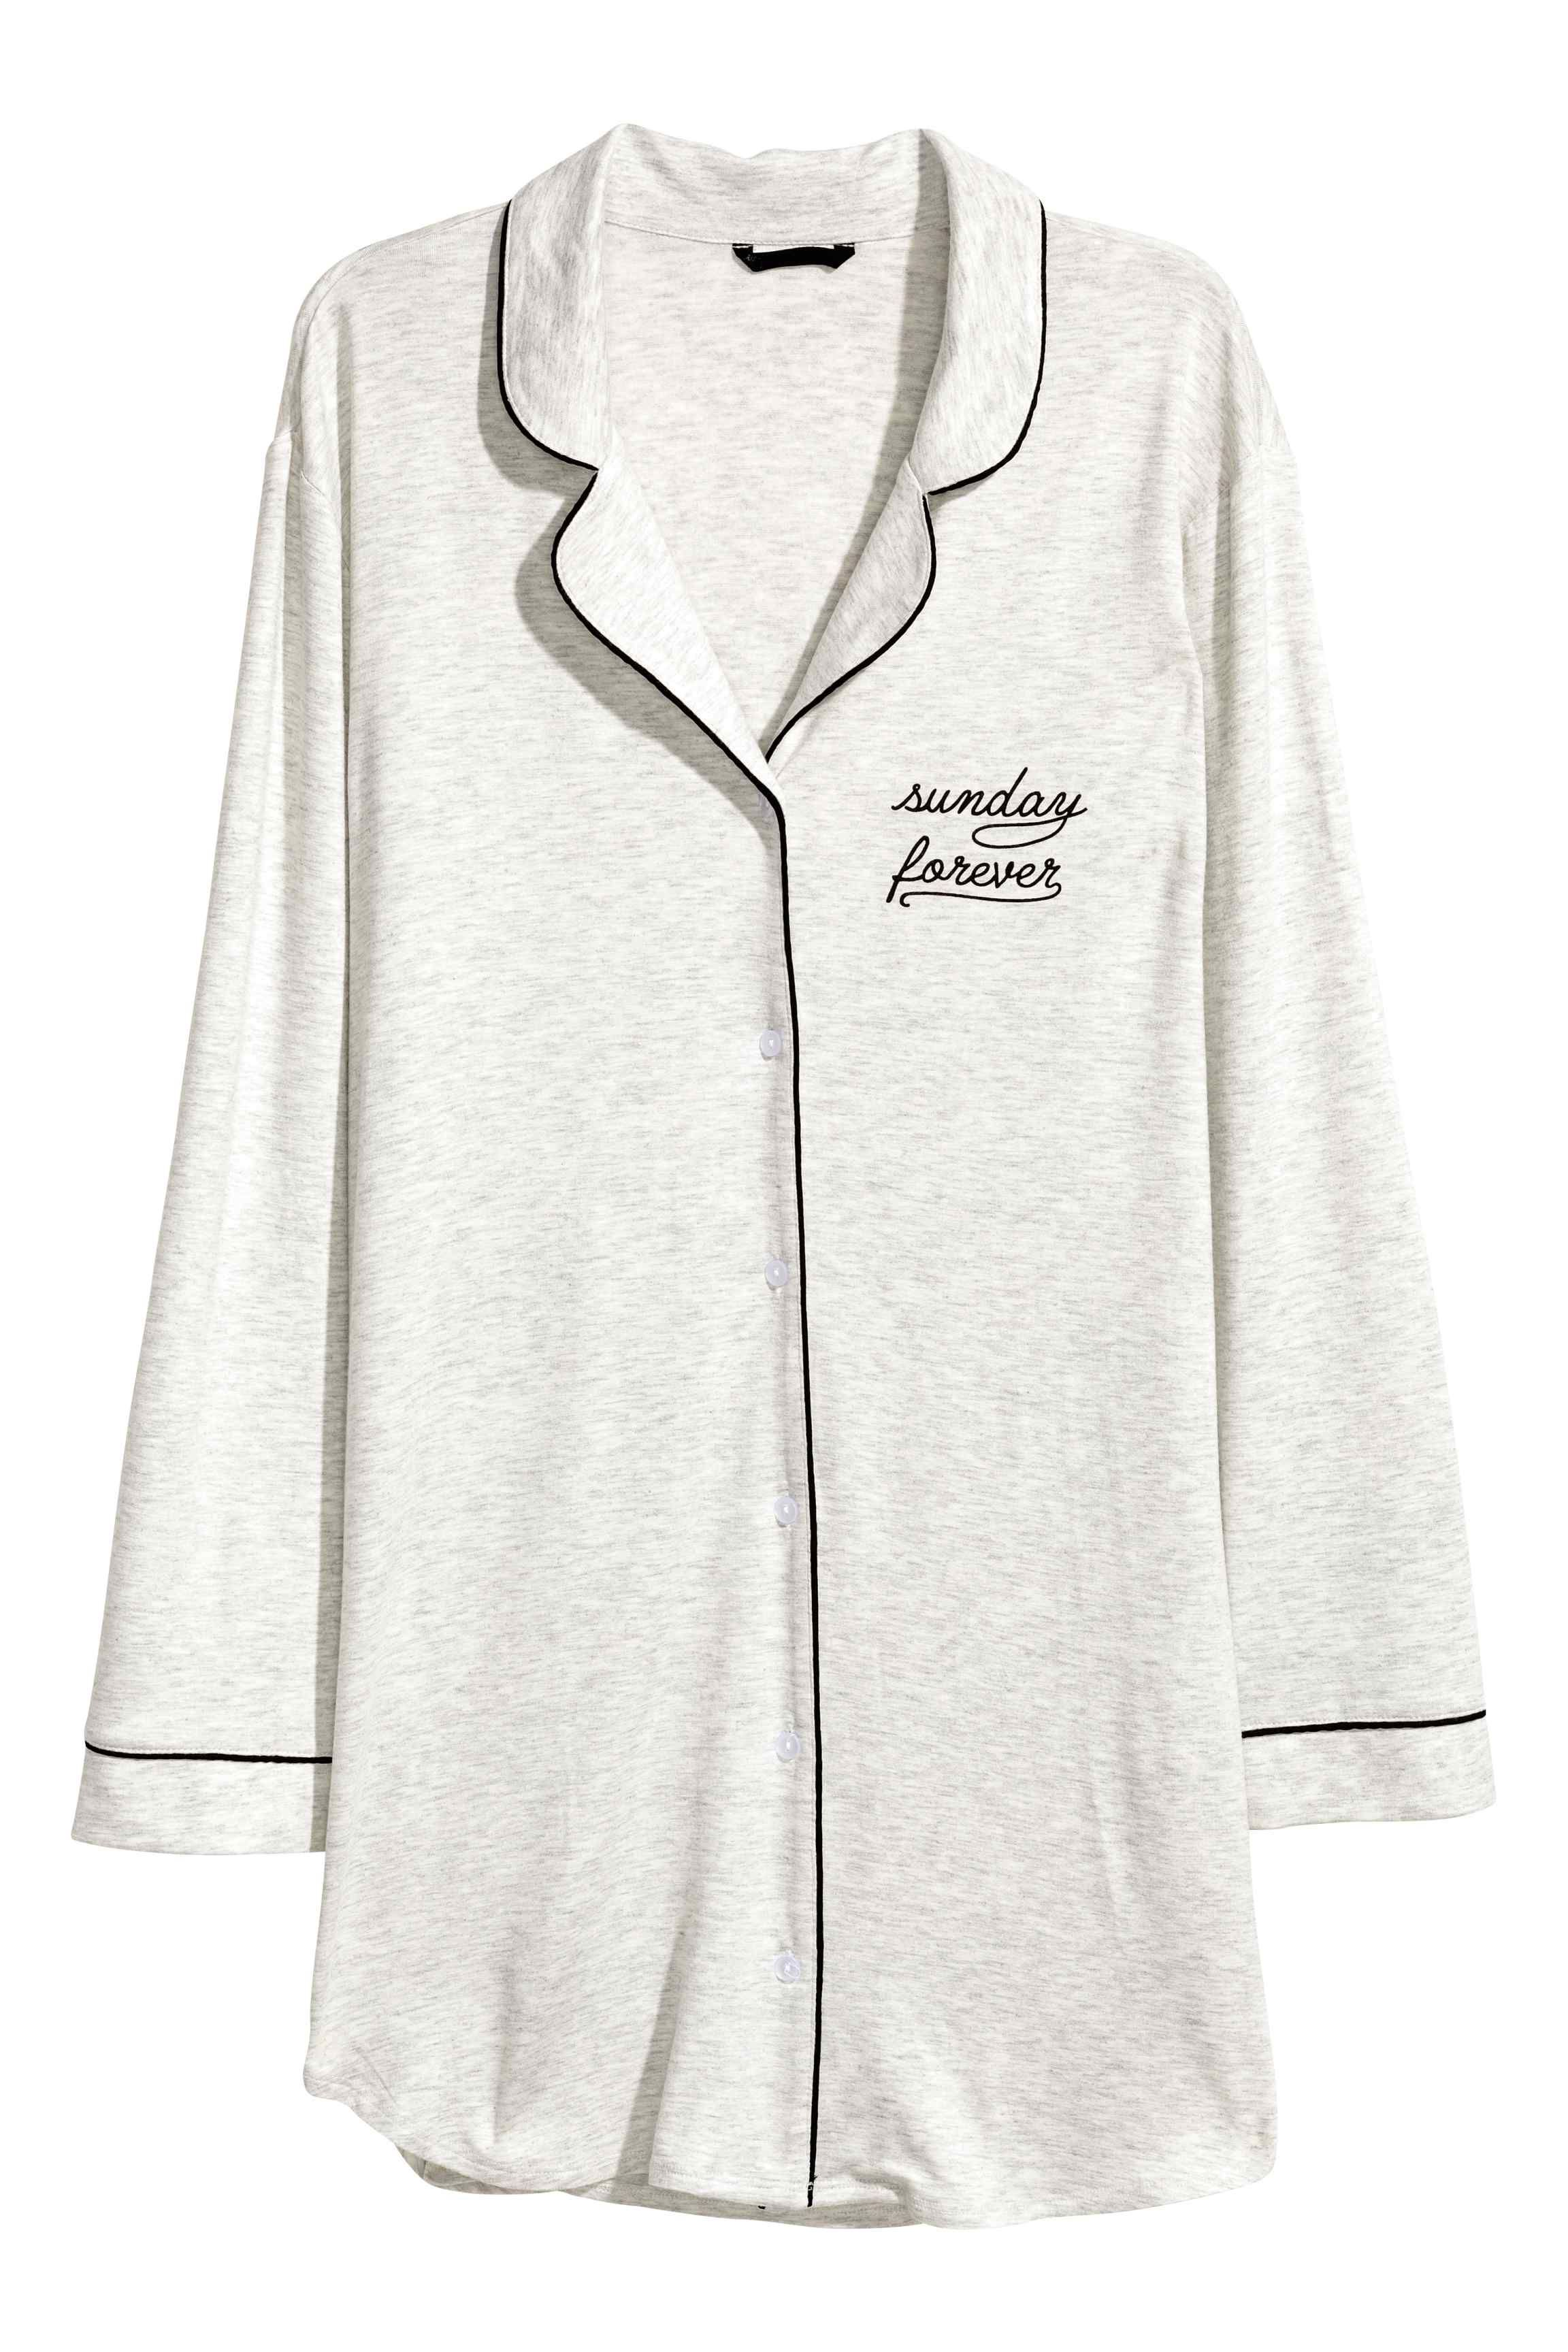 économiser 24522 6b859 Chemise de nuit en jersey | Pijamas in 2019 | Lounge wear ...